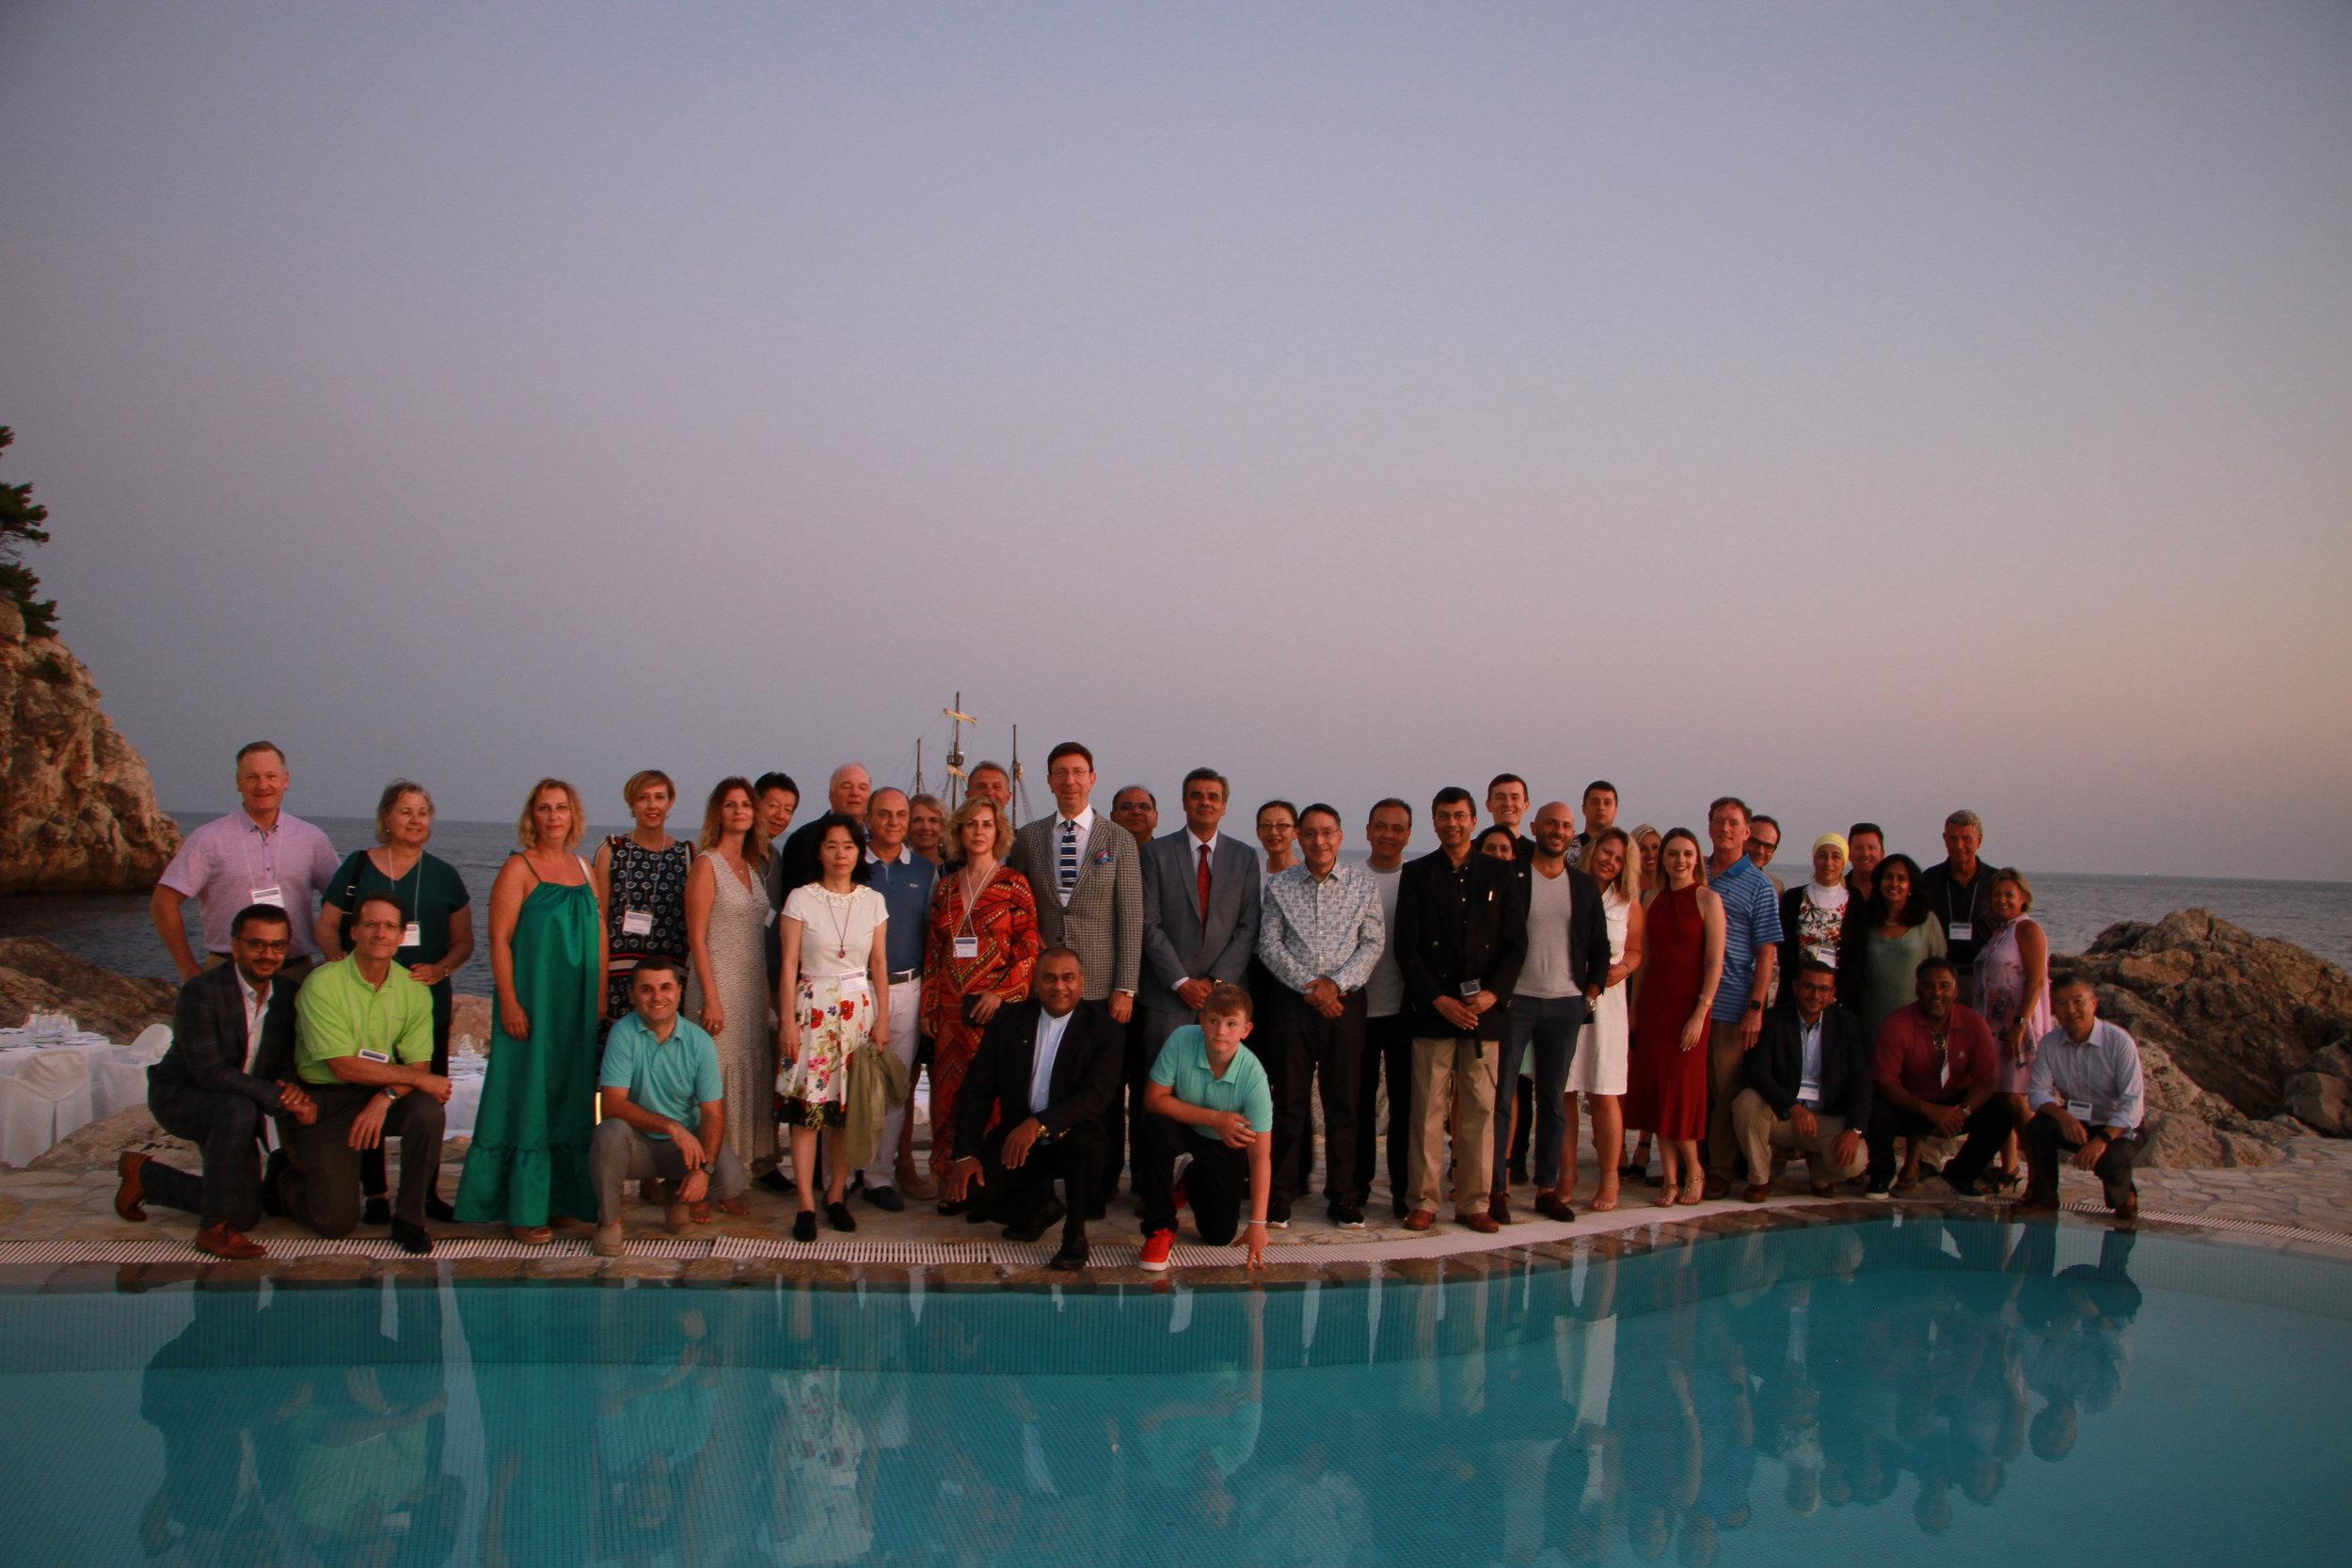 Group Photo: Dubrovnik, Croatia August 9, 2019